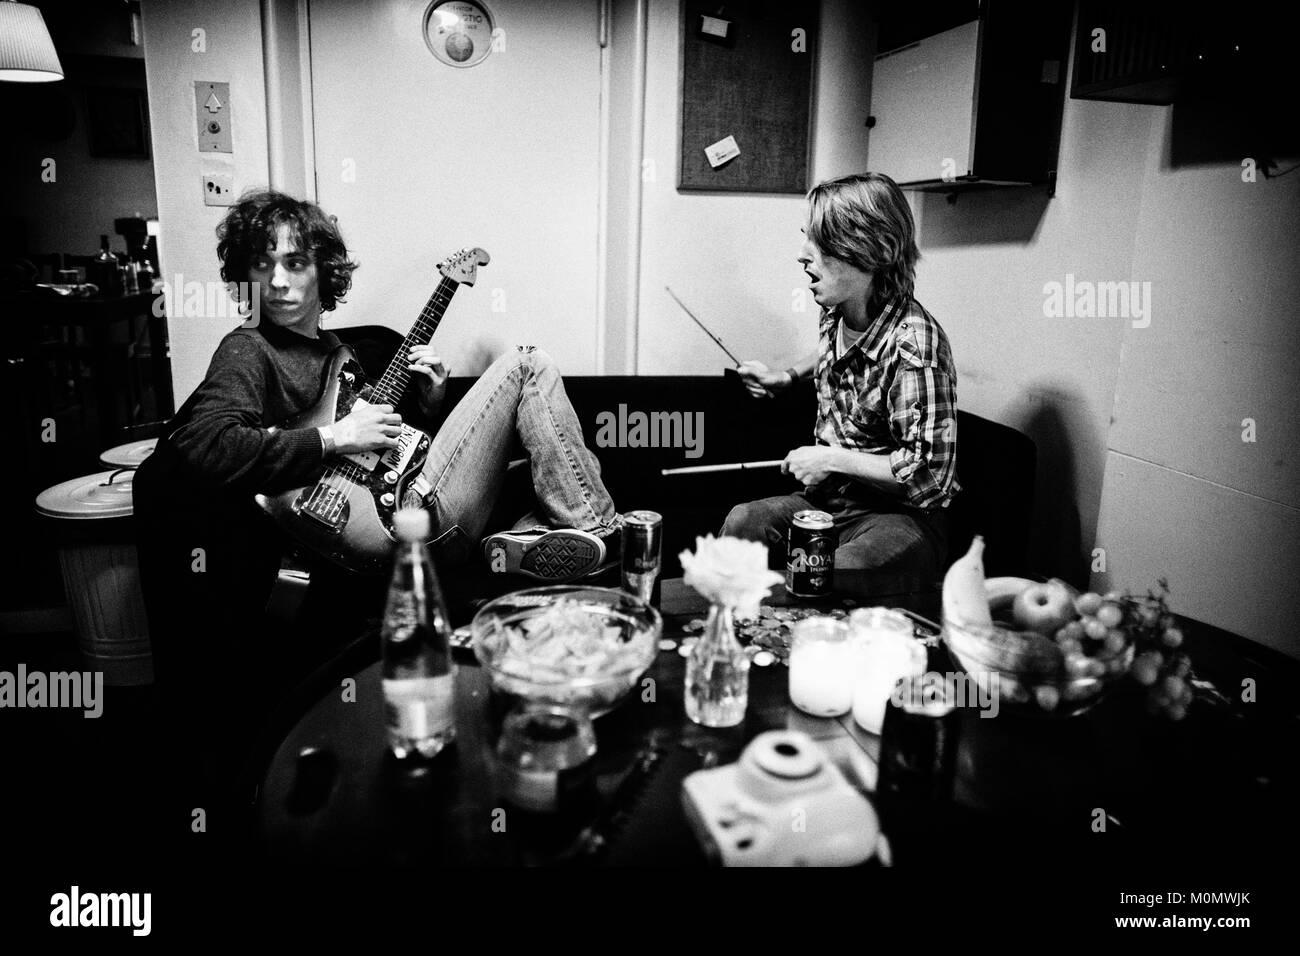 Honza and rado backstage